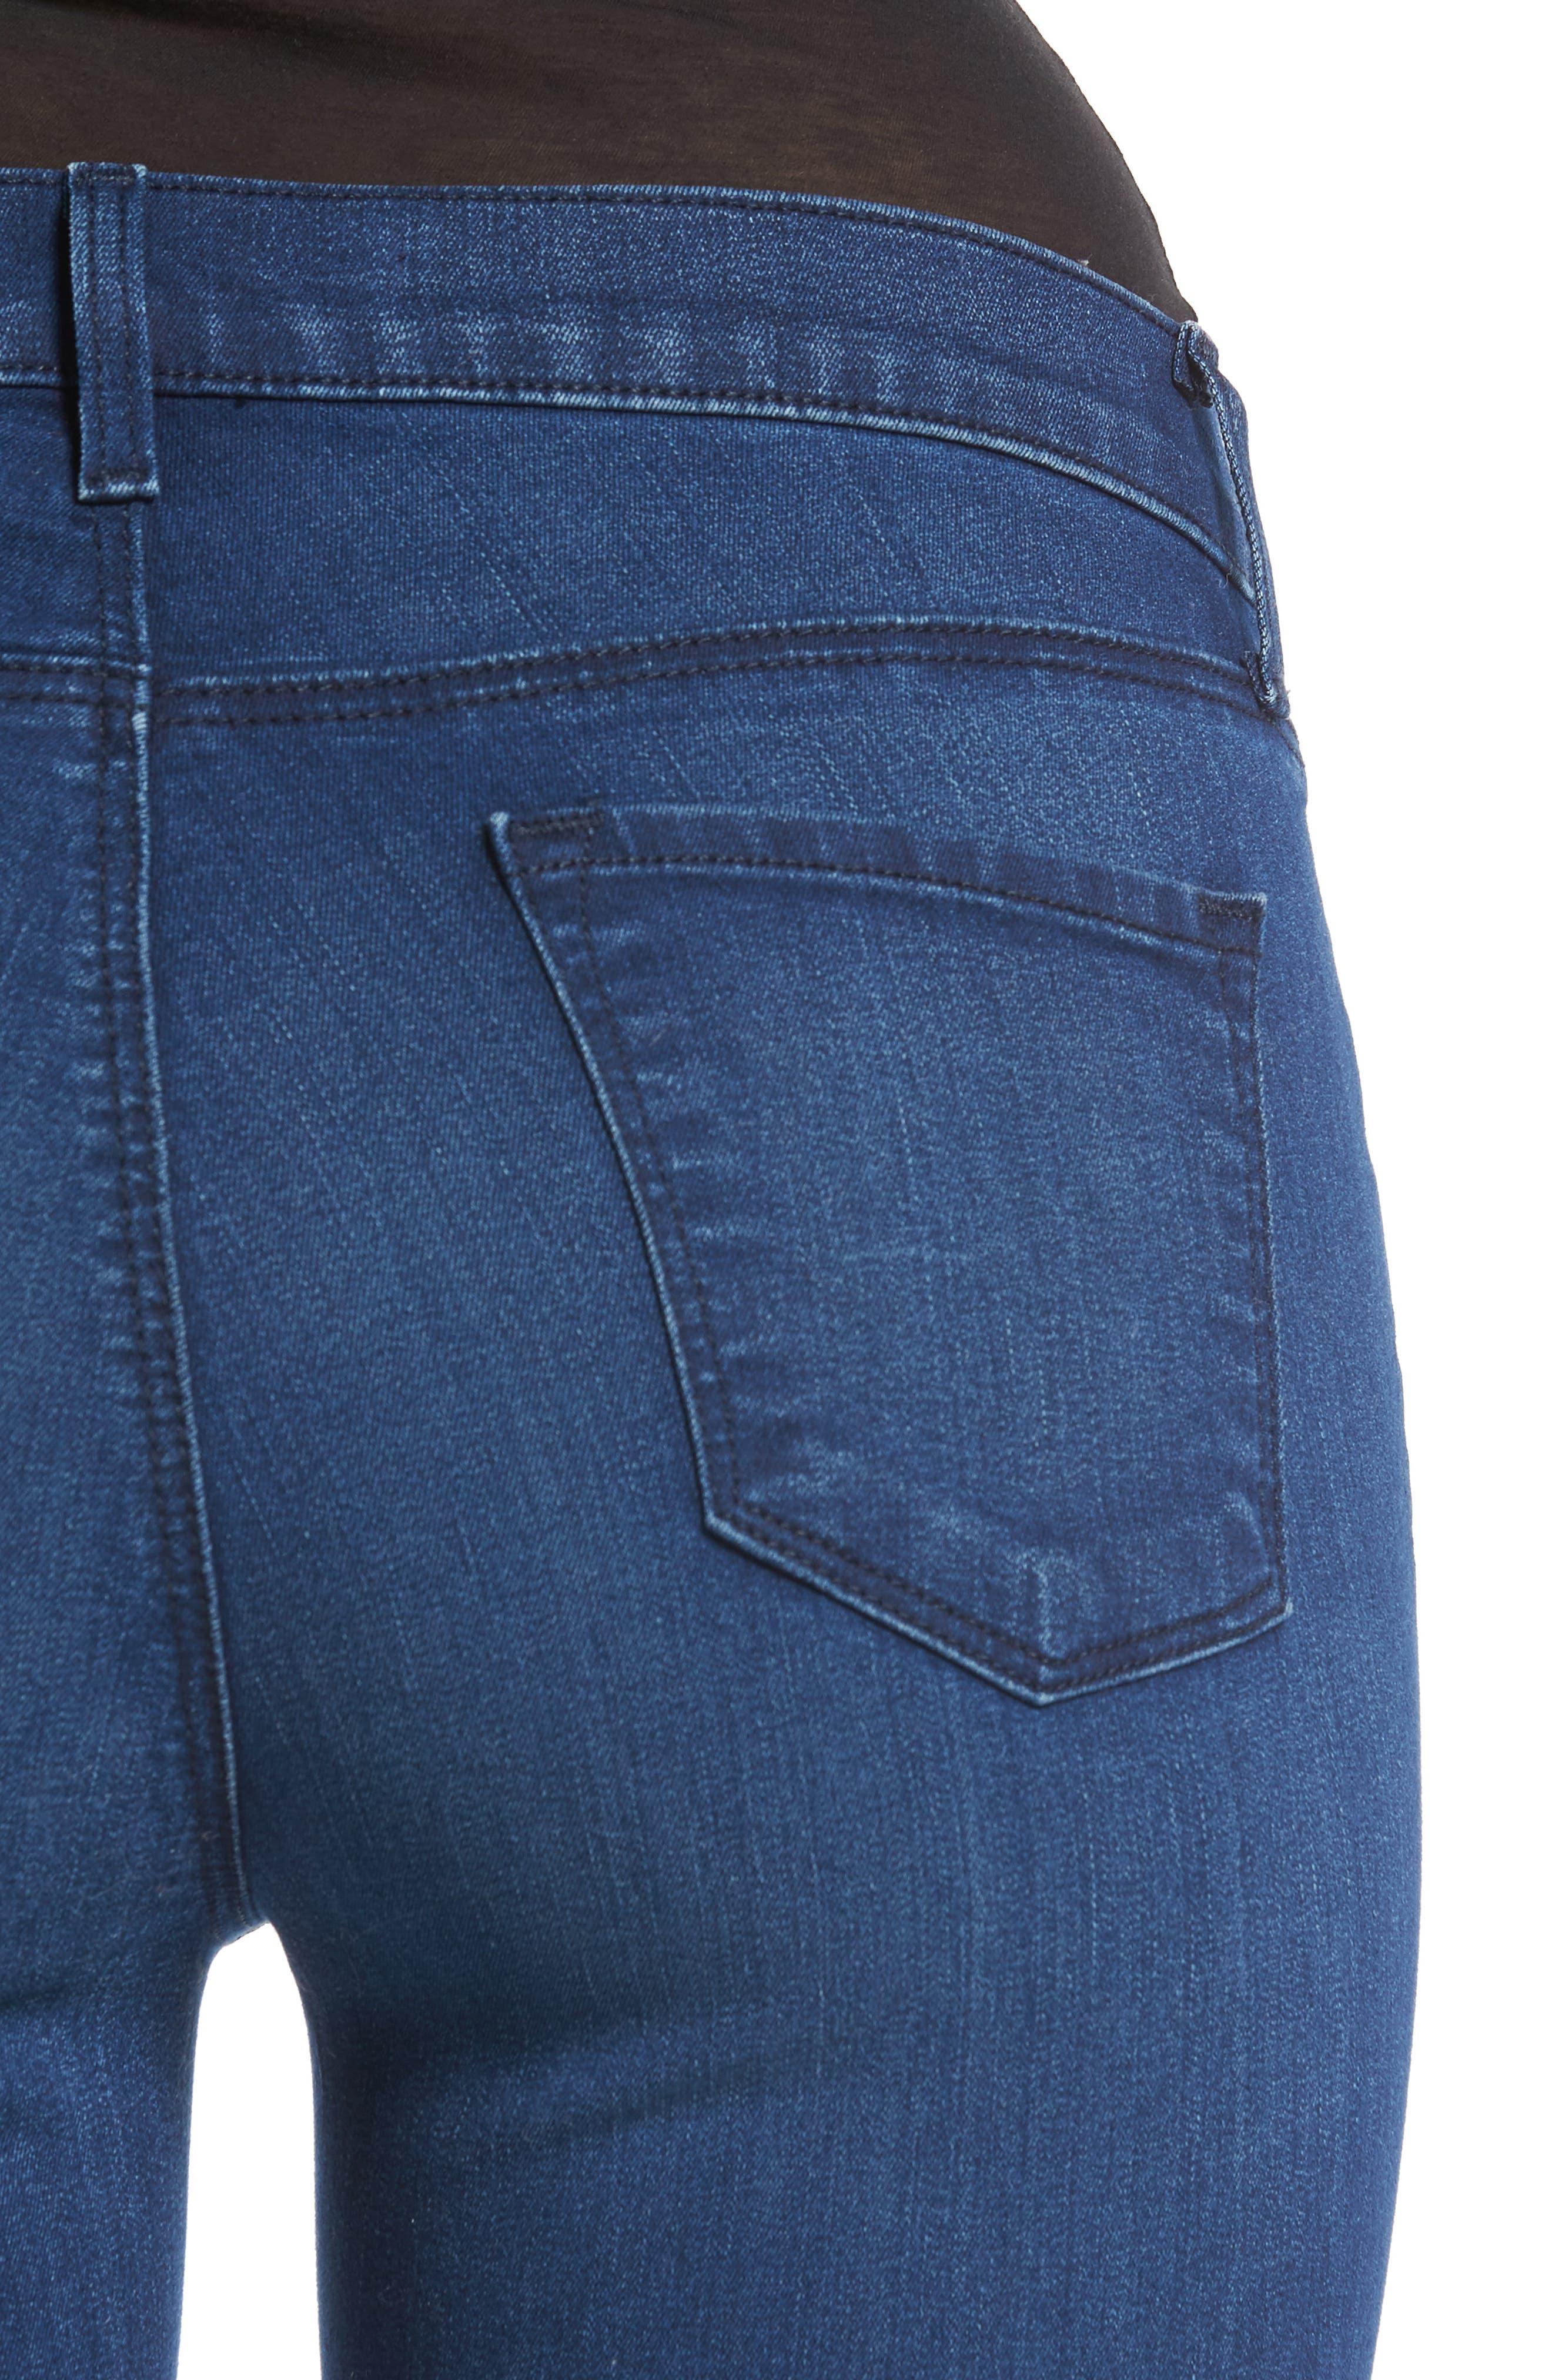 '811' Ankle Skinny Jeans,                             Alternate thumbnail 22, color,